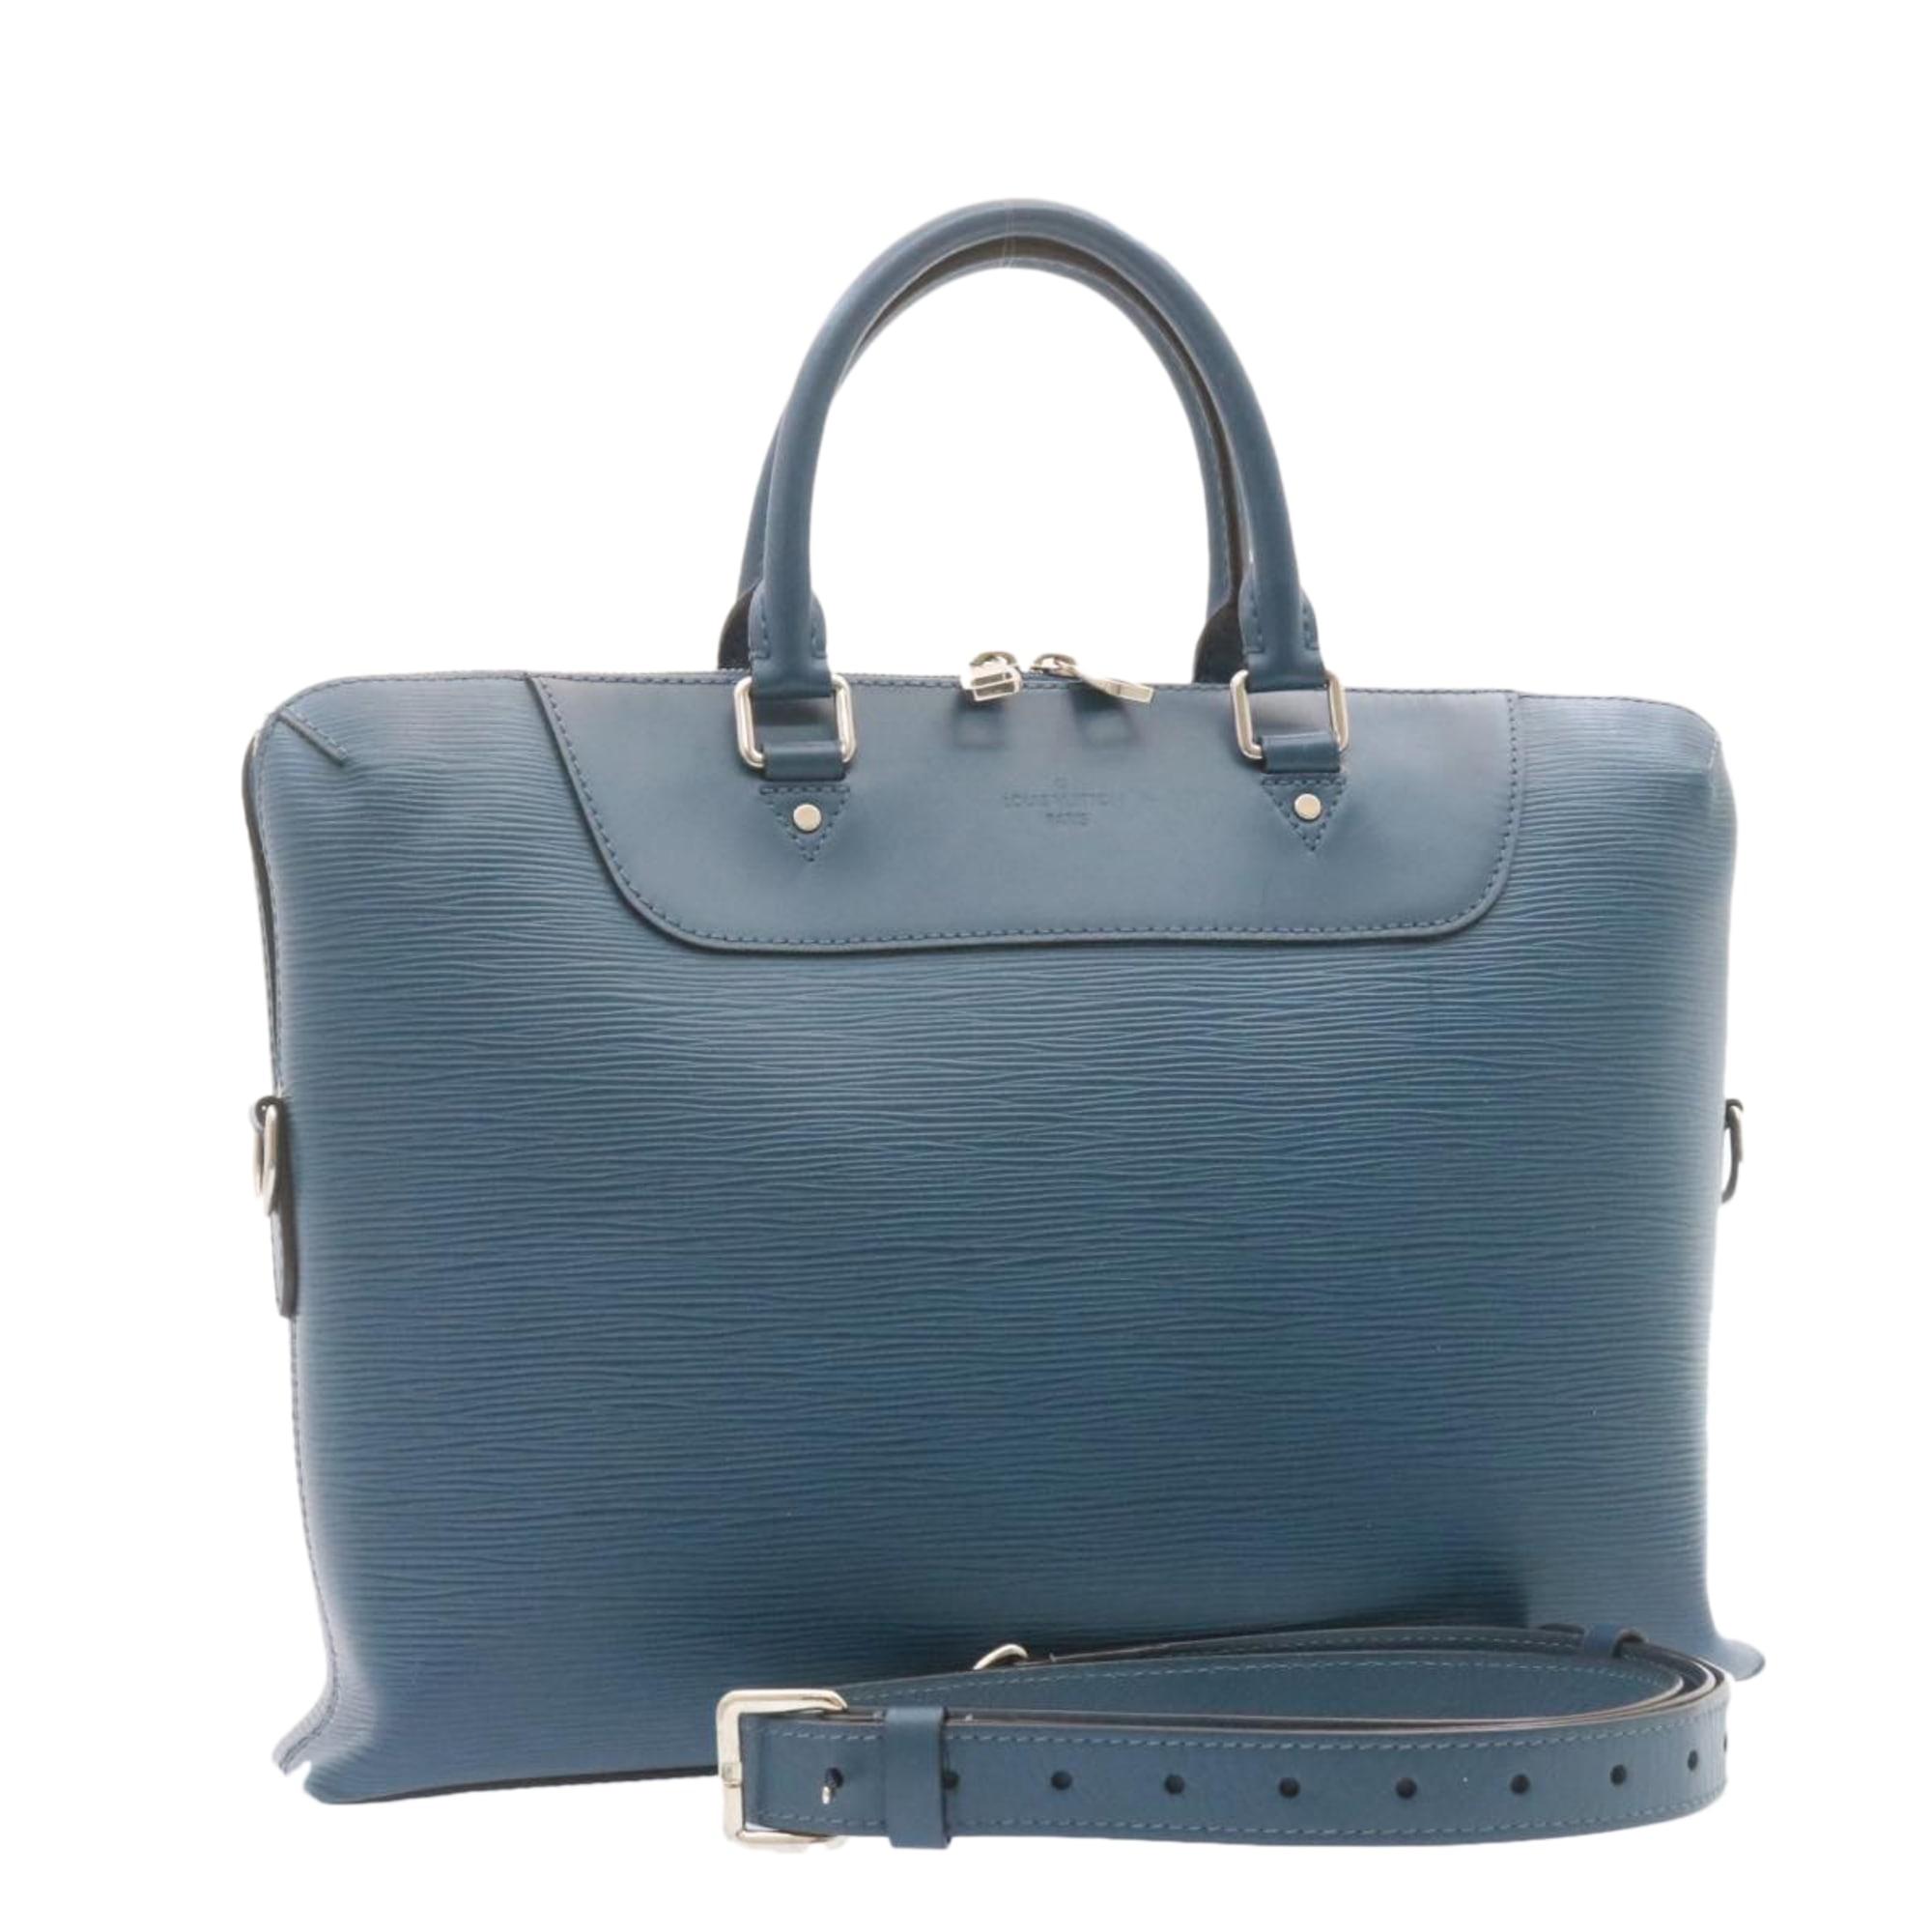 Mallette LOUIS VUITTON Bleu, bleu marine, bleu turquoise